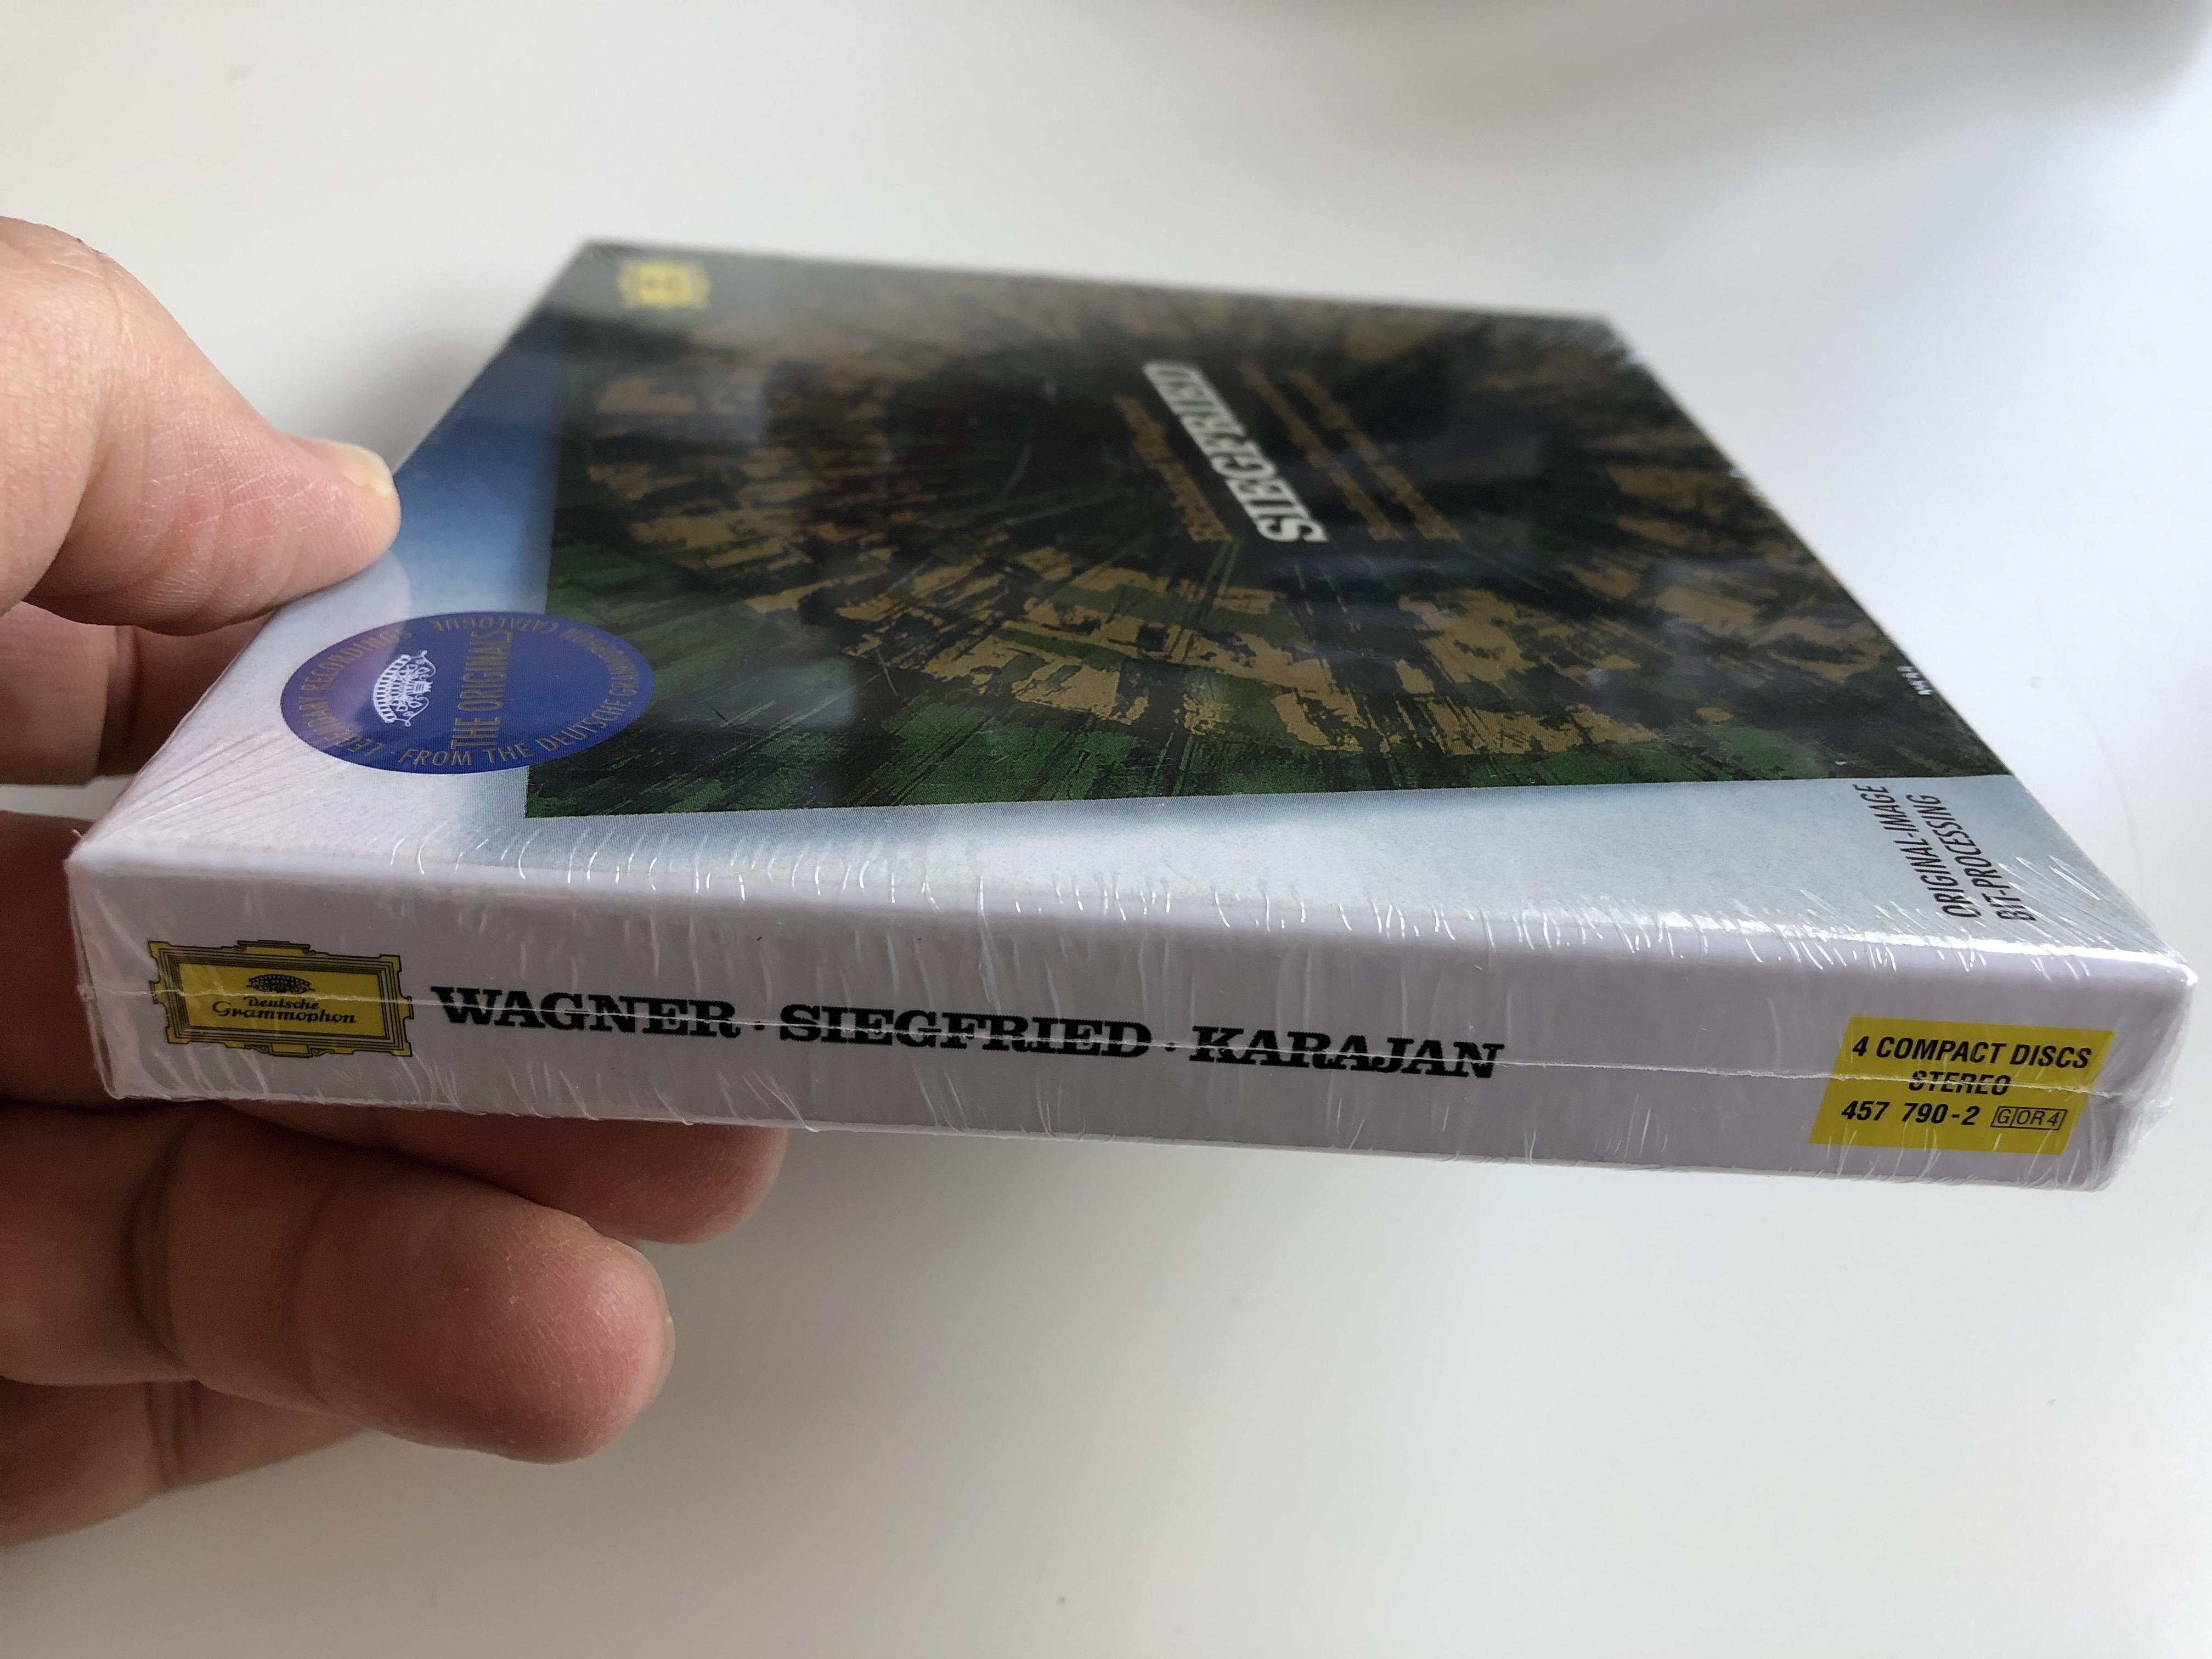 richard-wagner-siegfried-berliner-philharmoniker-herbert-von-karajan-deutsche-grammophon-4x-audio-cd-stereo-457-790-2-3-.jpg